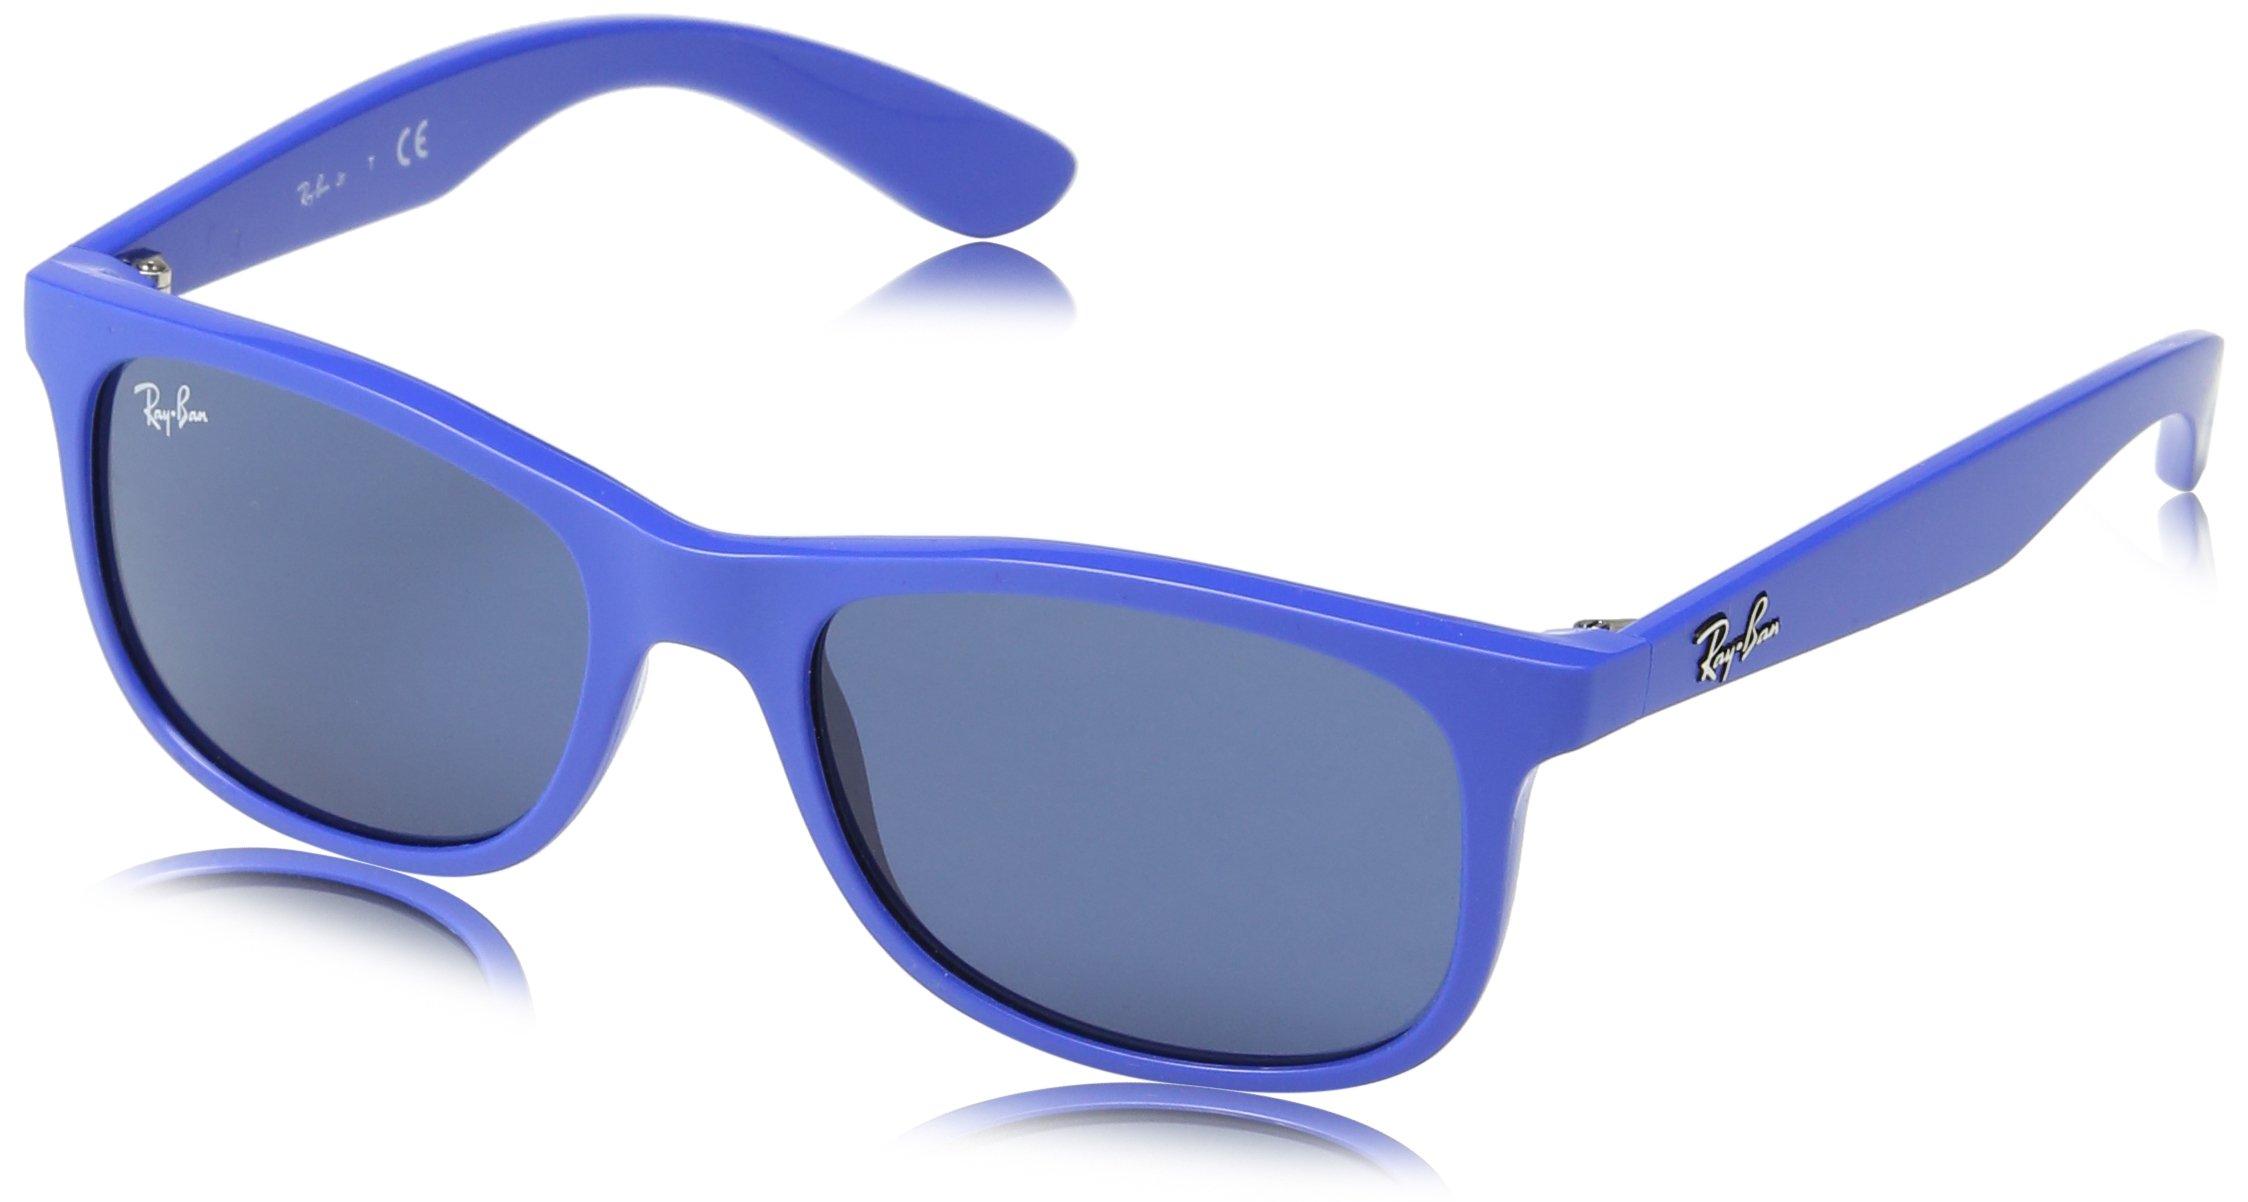 Ray-Ban Junior 0rj9062s Rectangular Sunglasses, Matte Blue, 48 mm